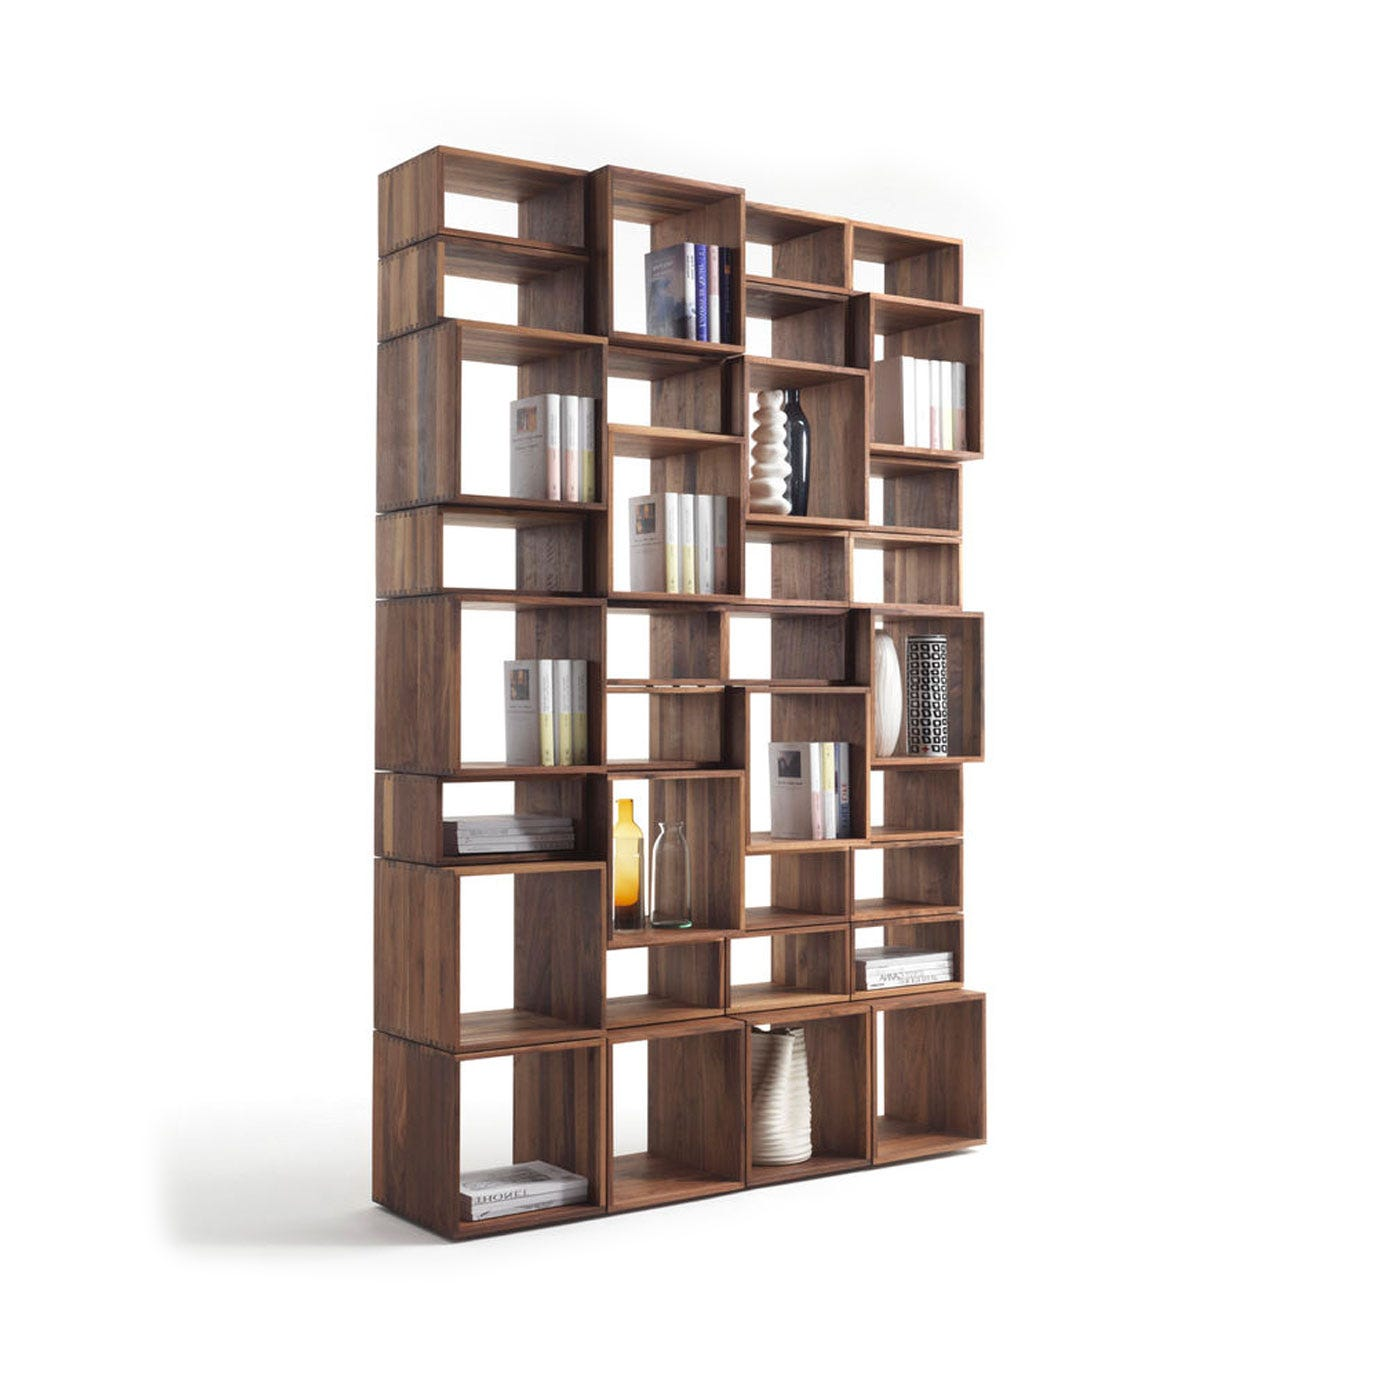 Wood Furniture Design Catalog Home Decor Photos Gallery